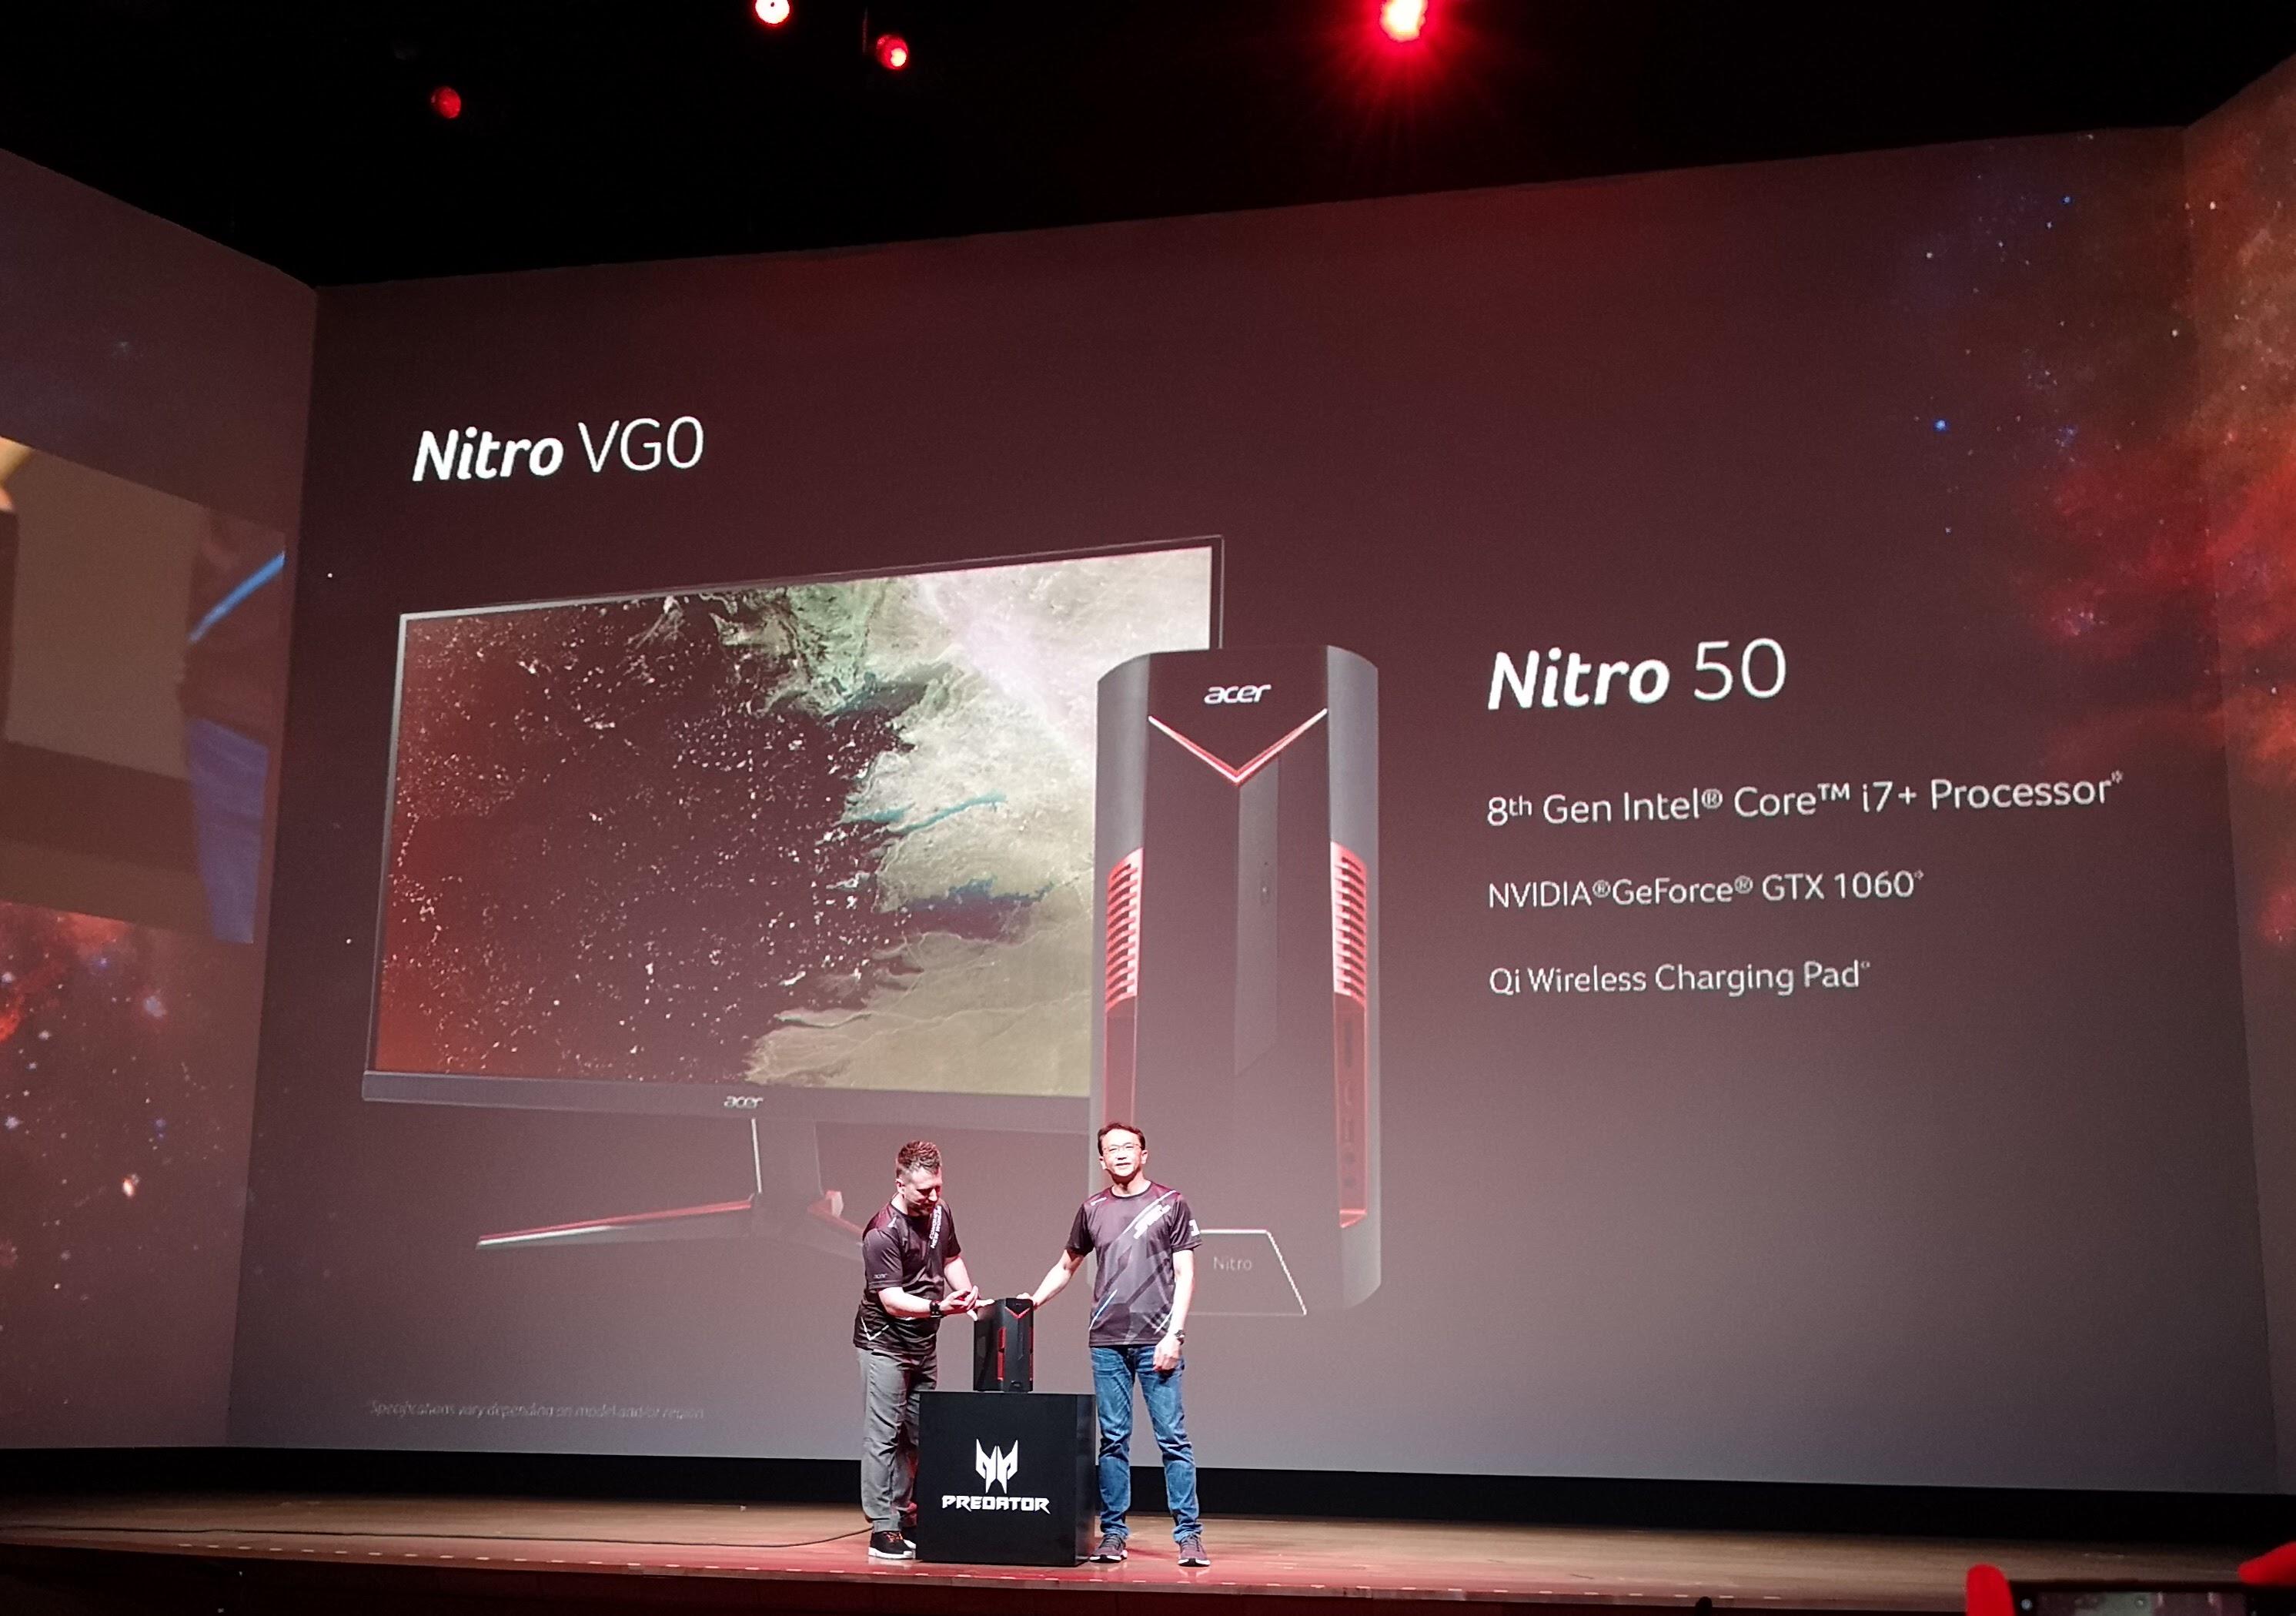 Ny Nitro-maskin fra Acer